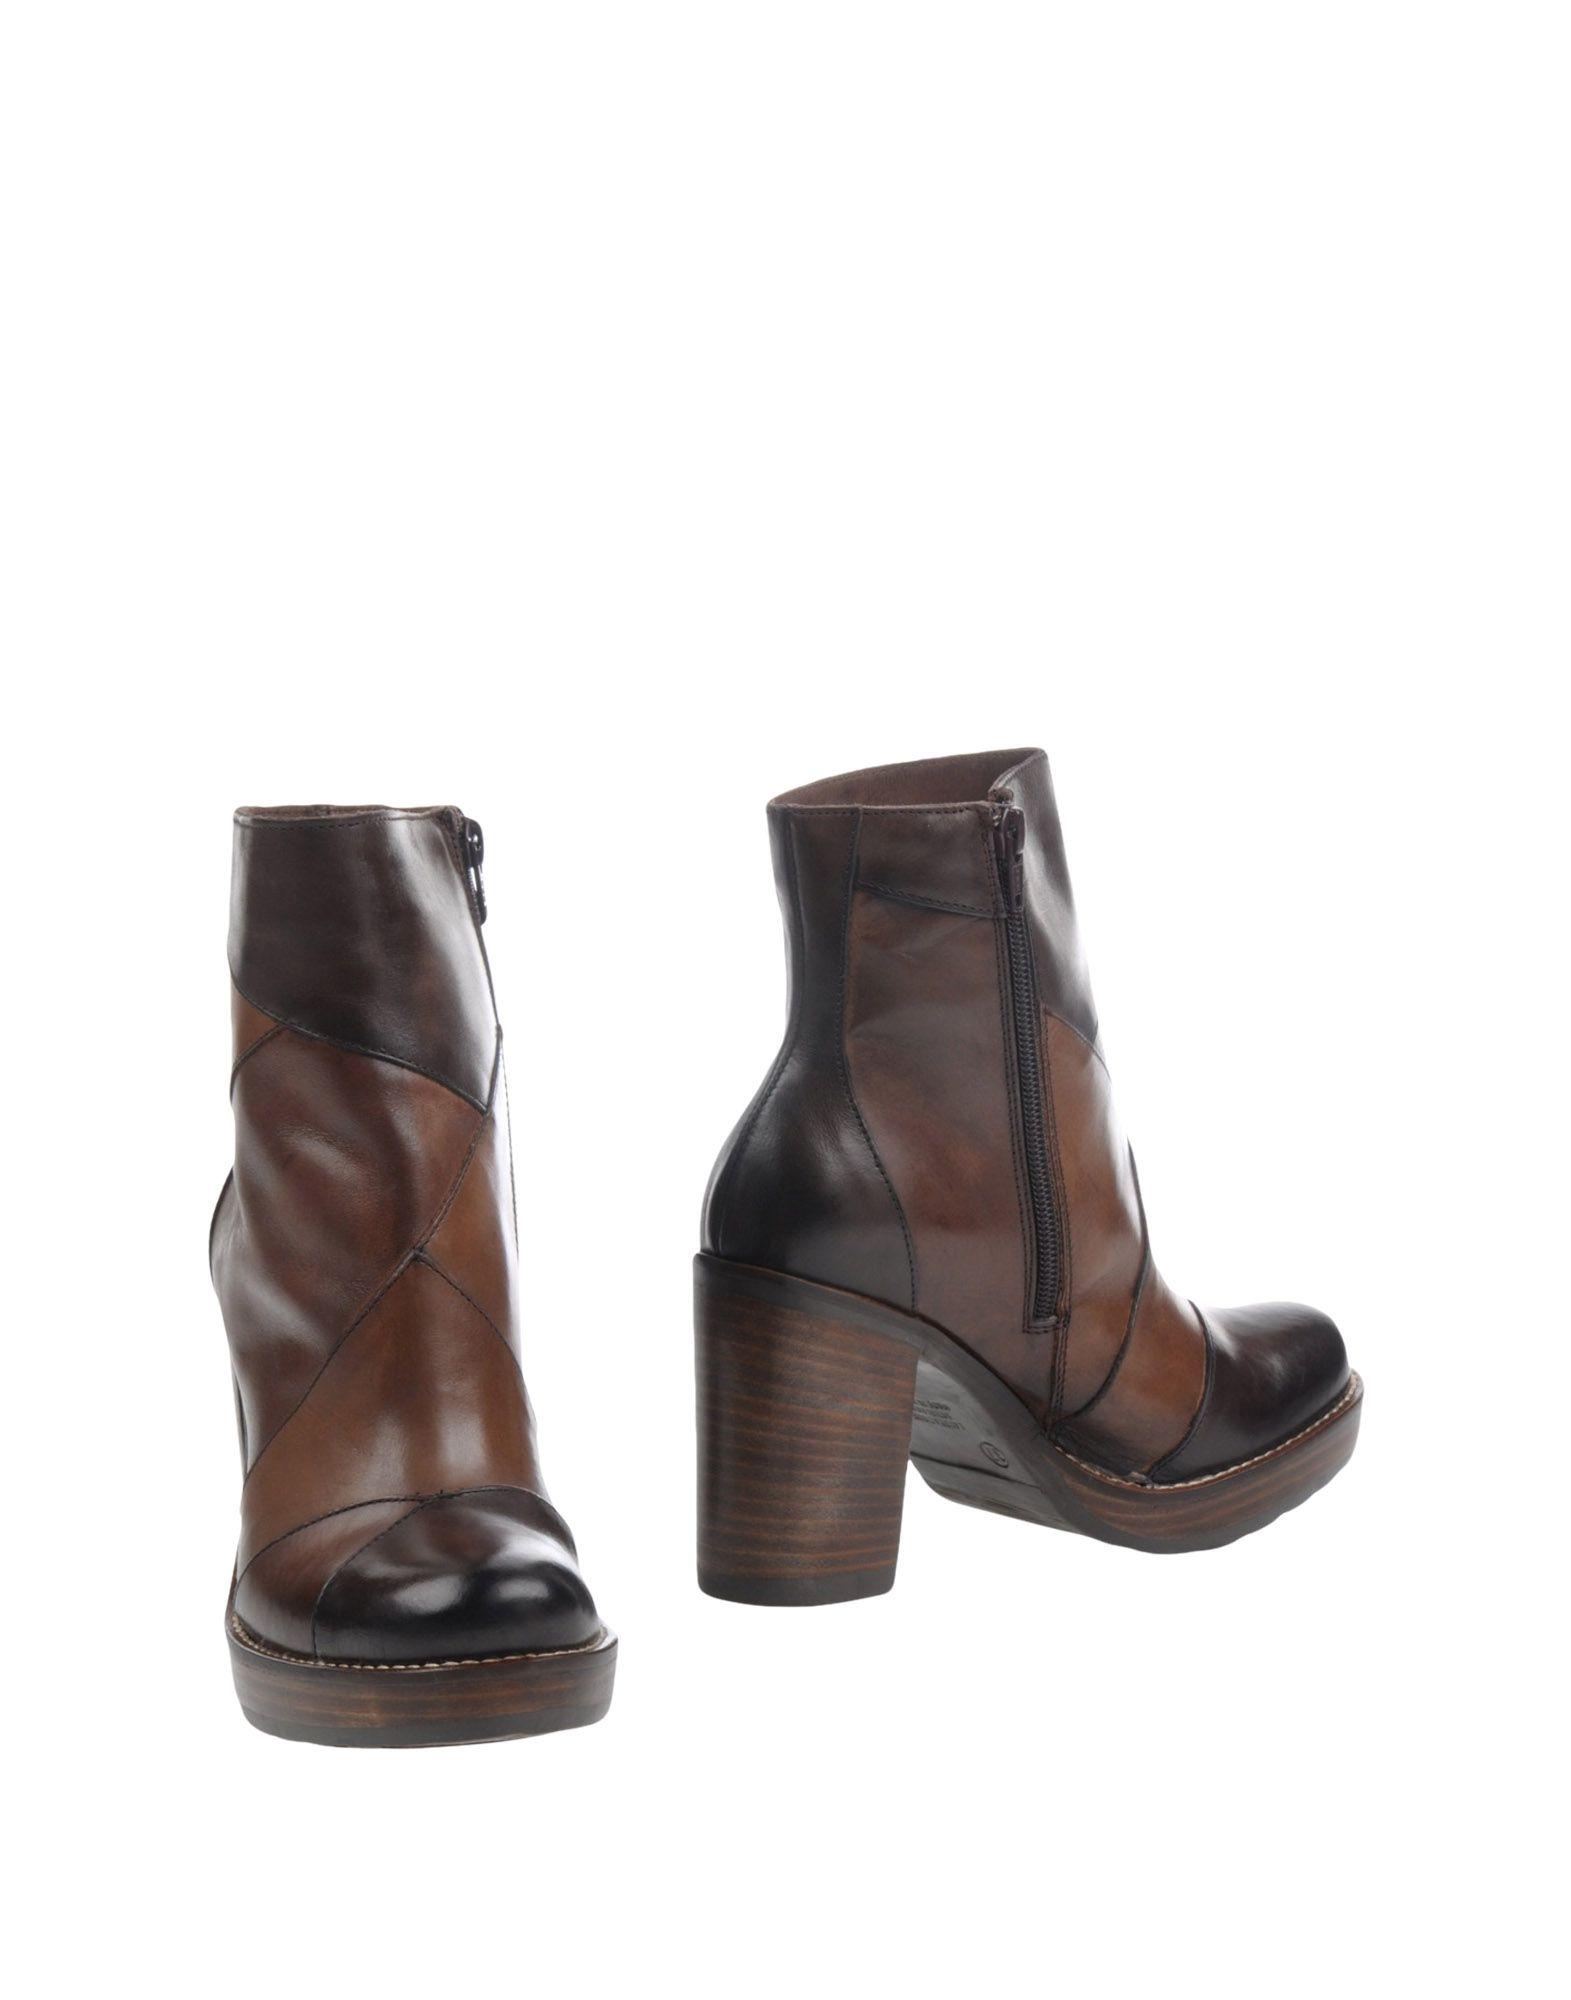 Donna Più Gute Stiefelette Damen  11280551XS Gute Più Qualität beliebte Schuhe a68012